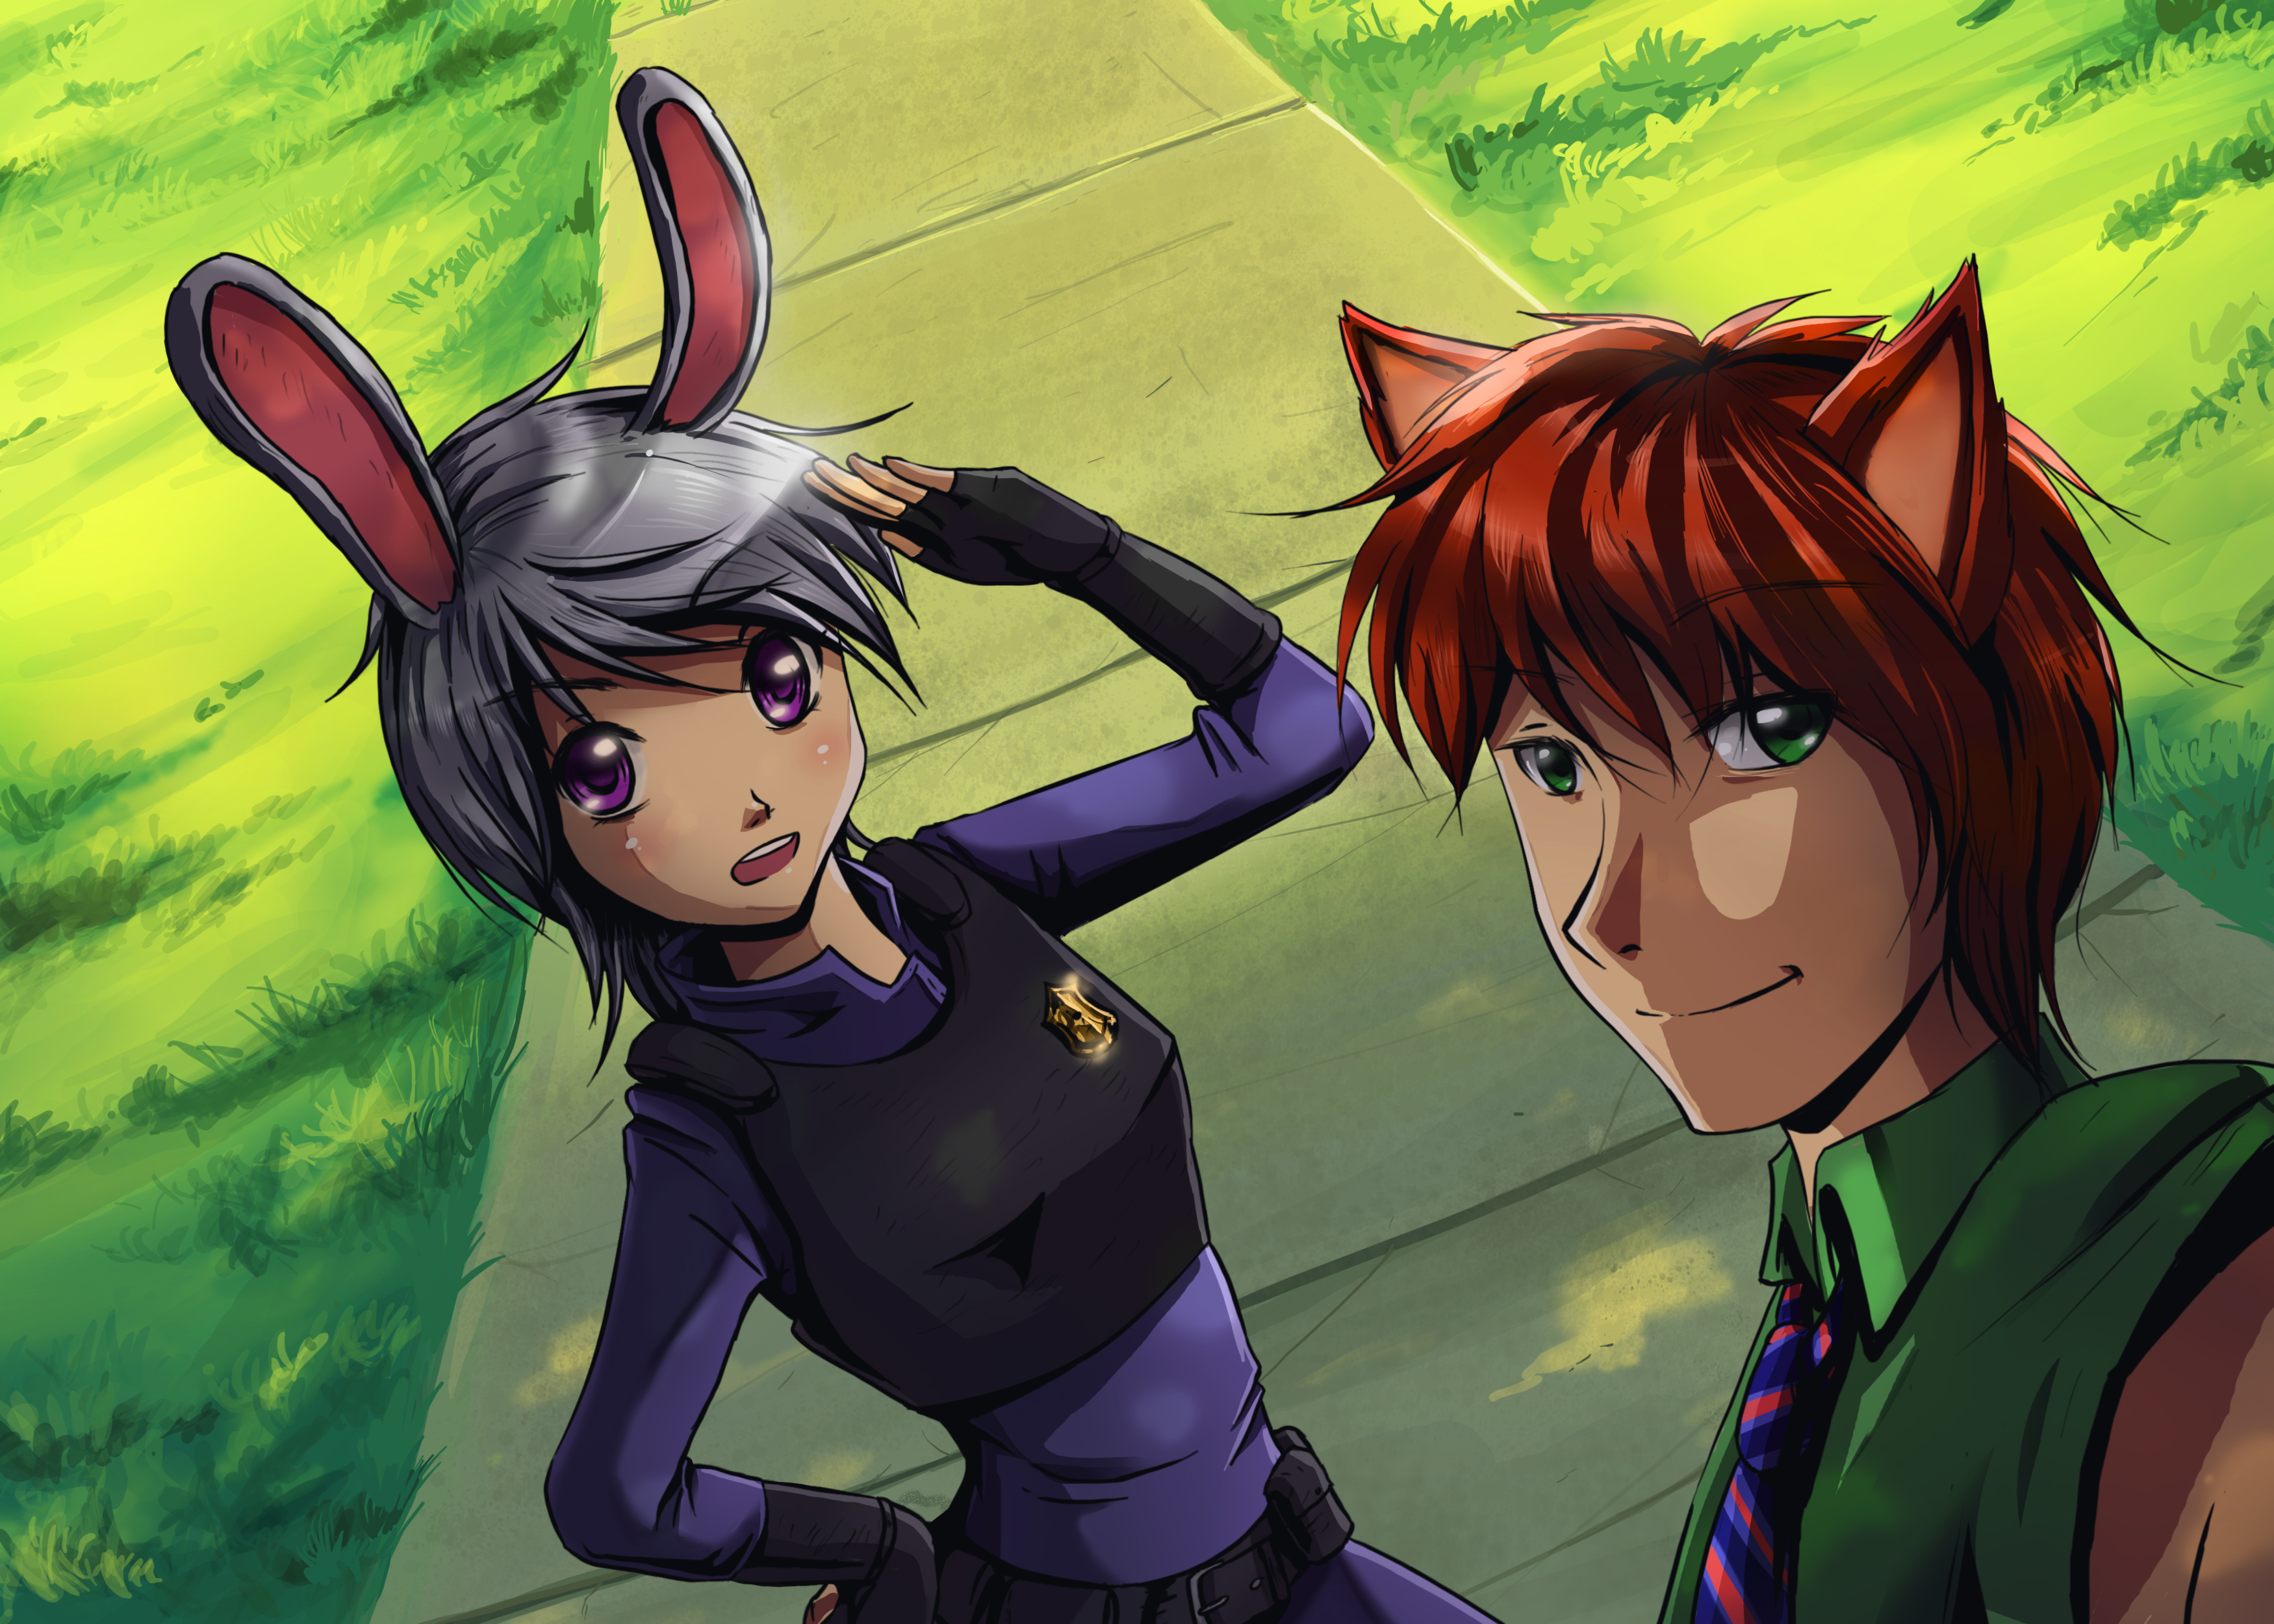 Zootopia: Judy hopps and Nick wilde (in anime)